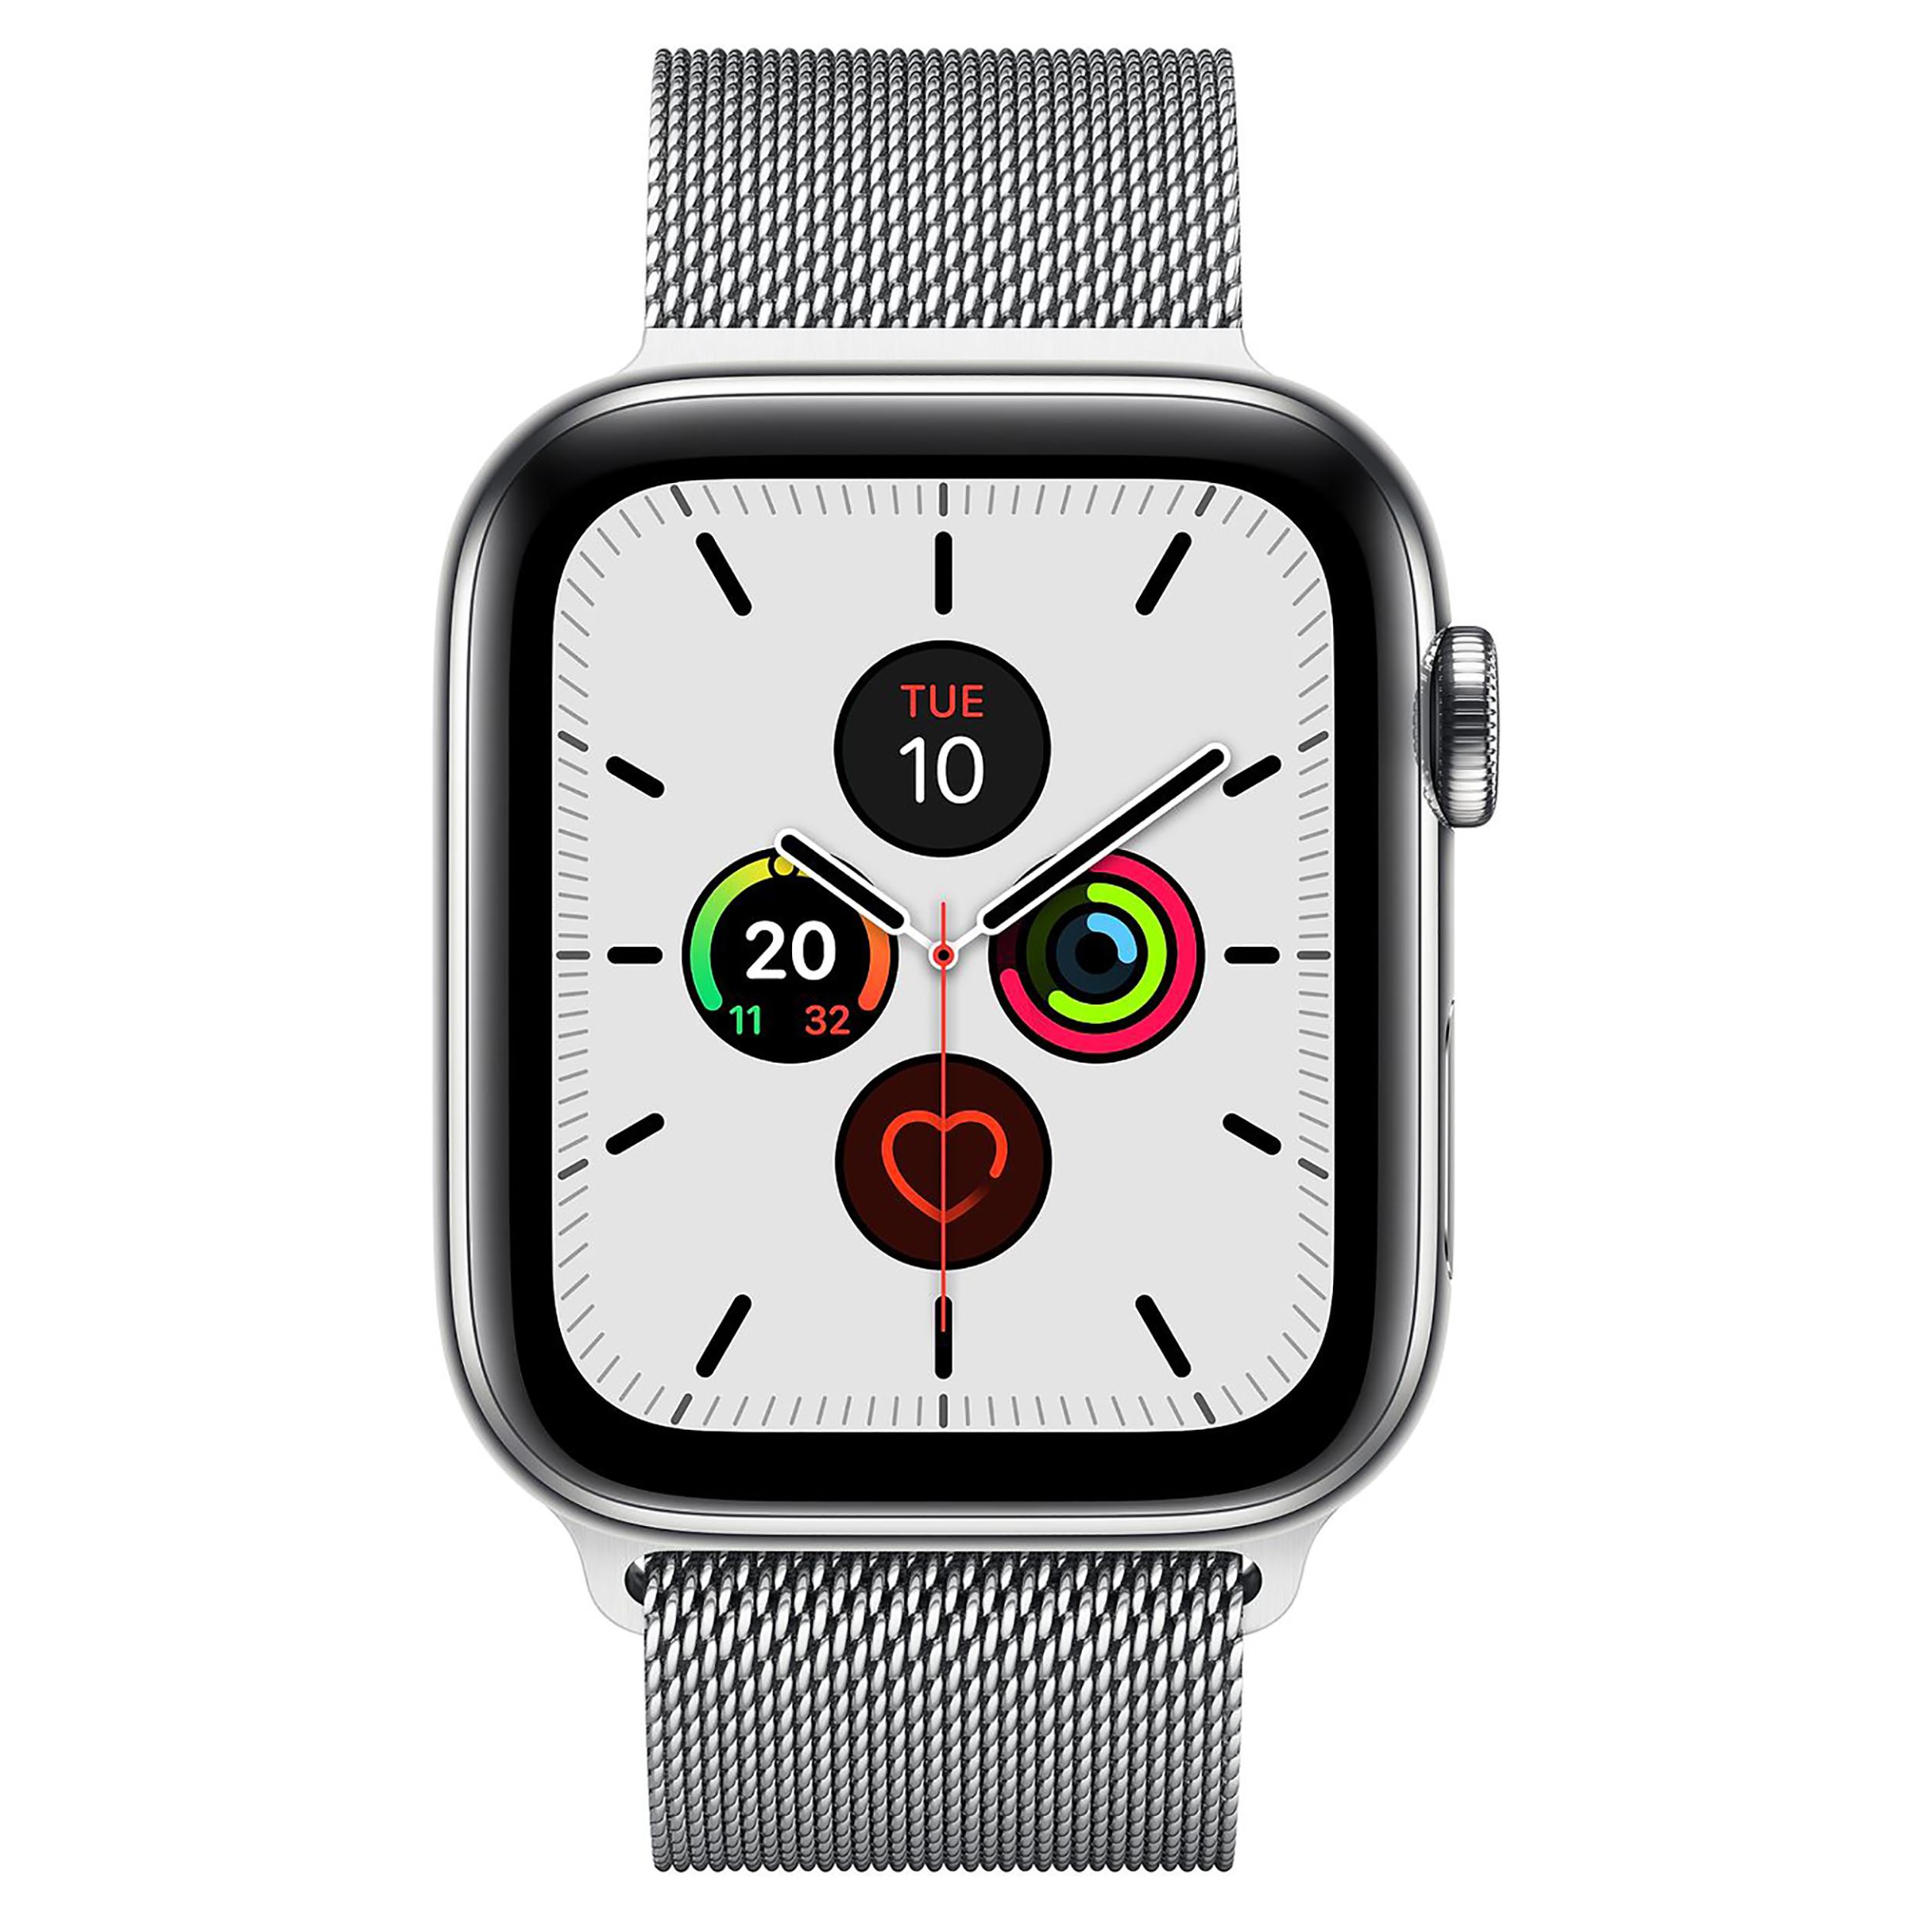 ساعت هوشمند اپل واچ سری 5 مدل 44mm Stainless Steel Case with Milanese Loop